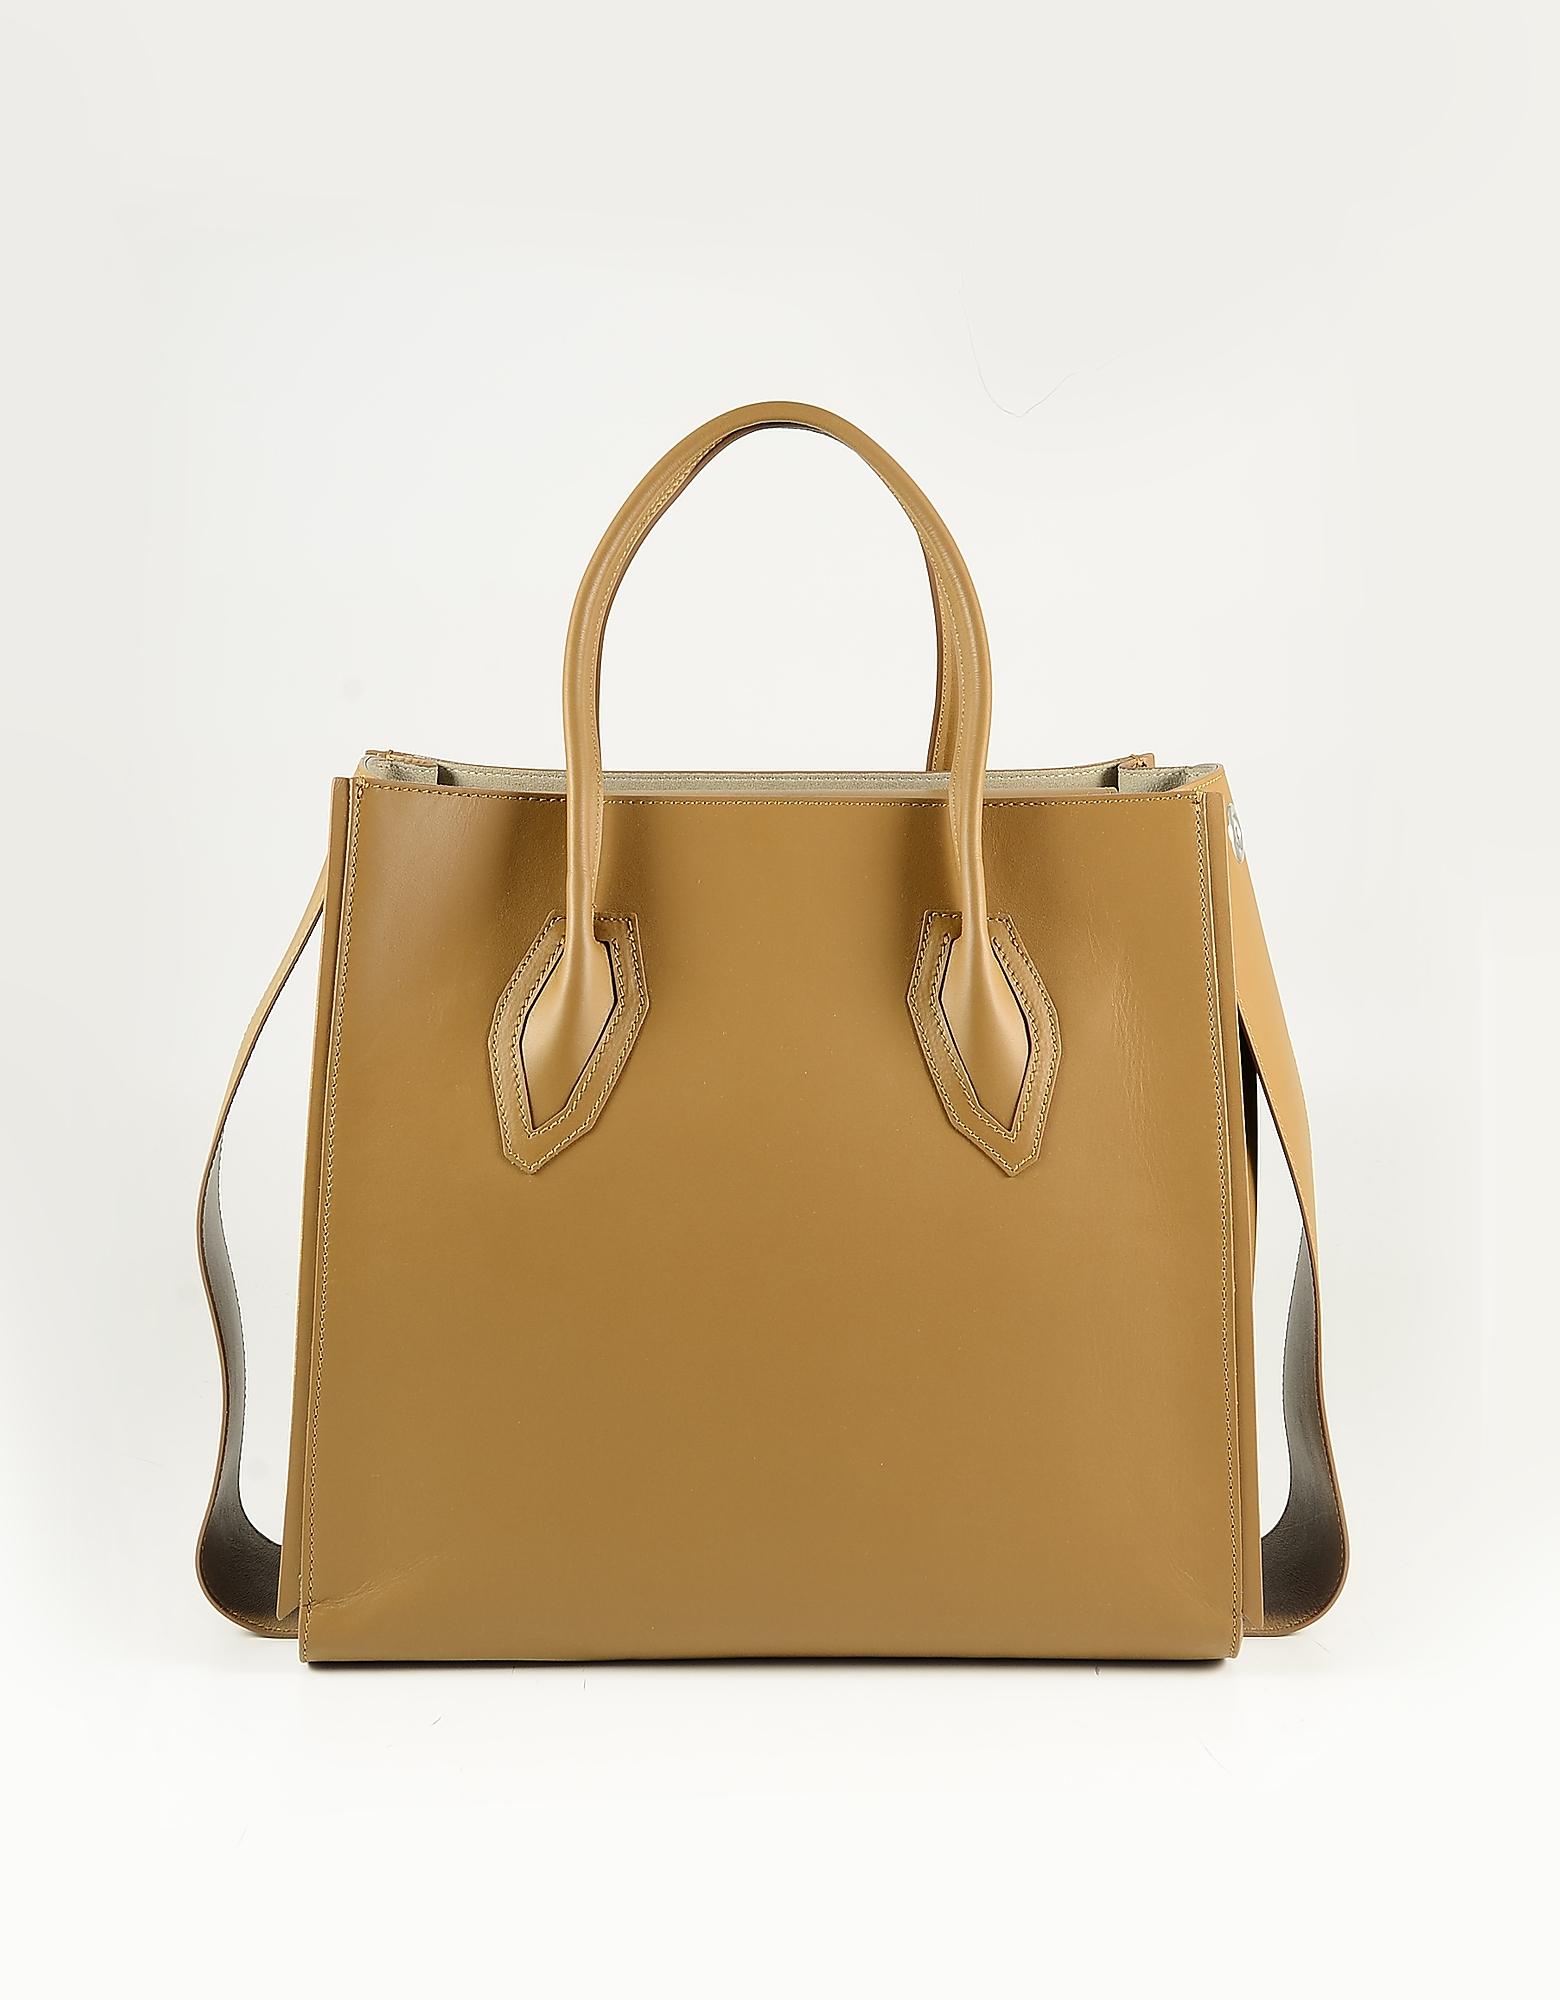 Patrizia Pepe Brown Leather Tote Bag